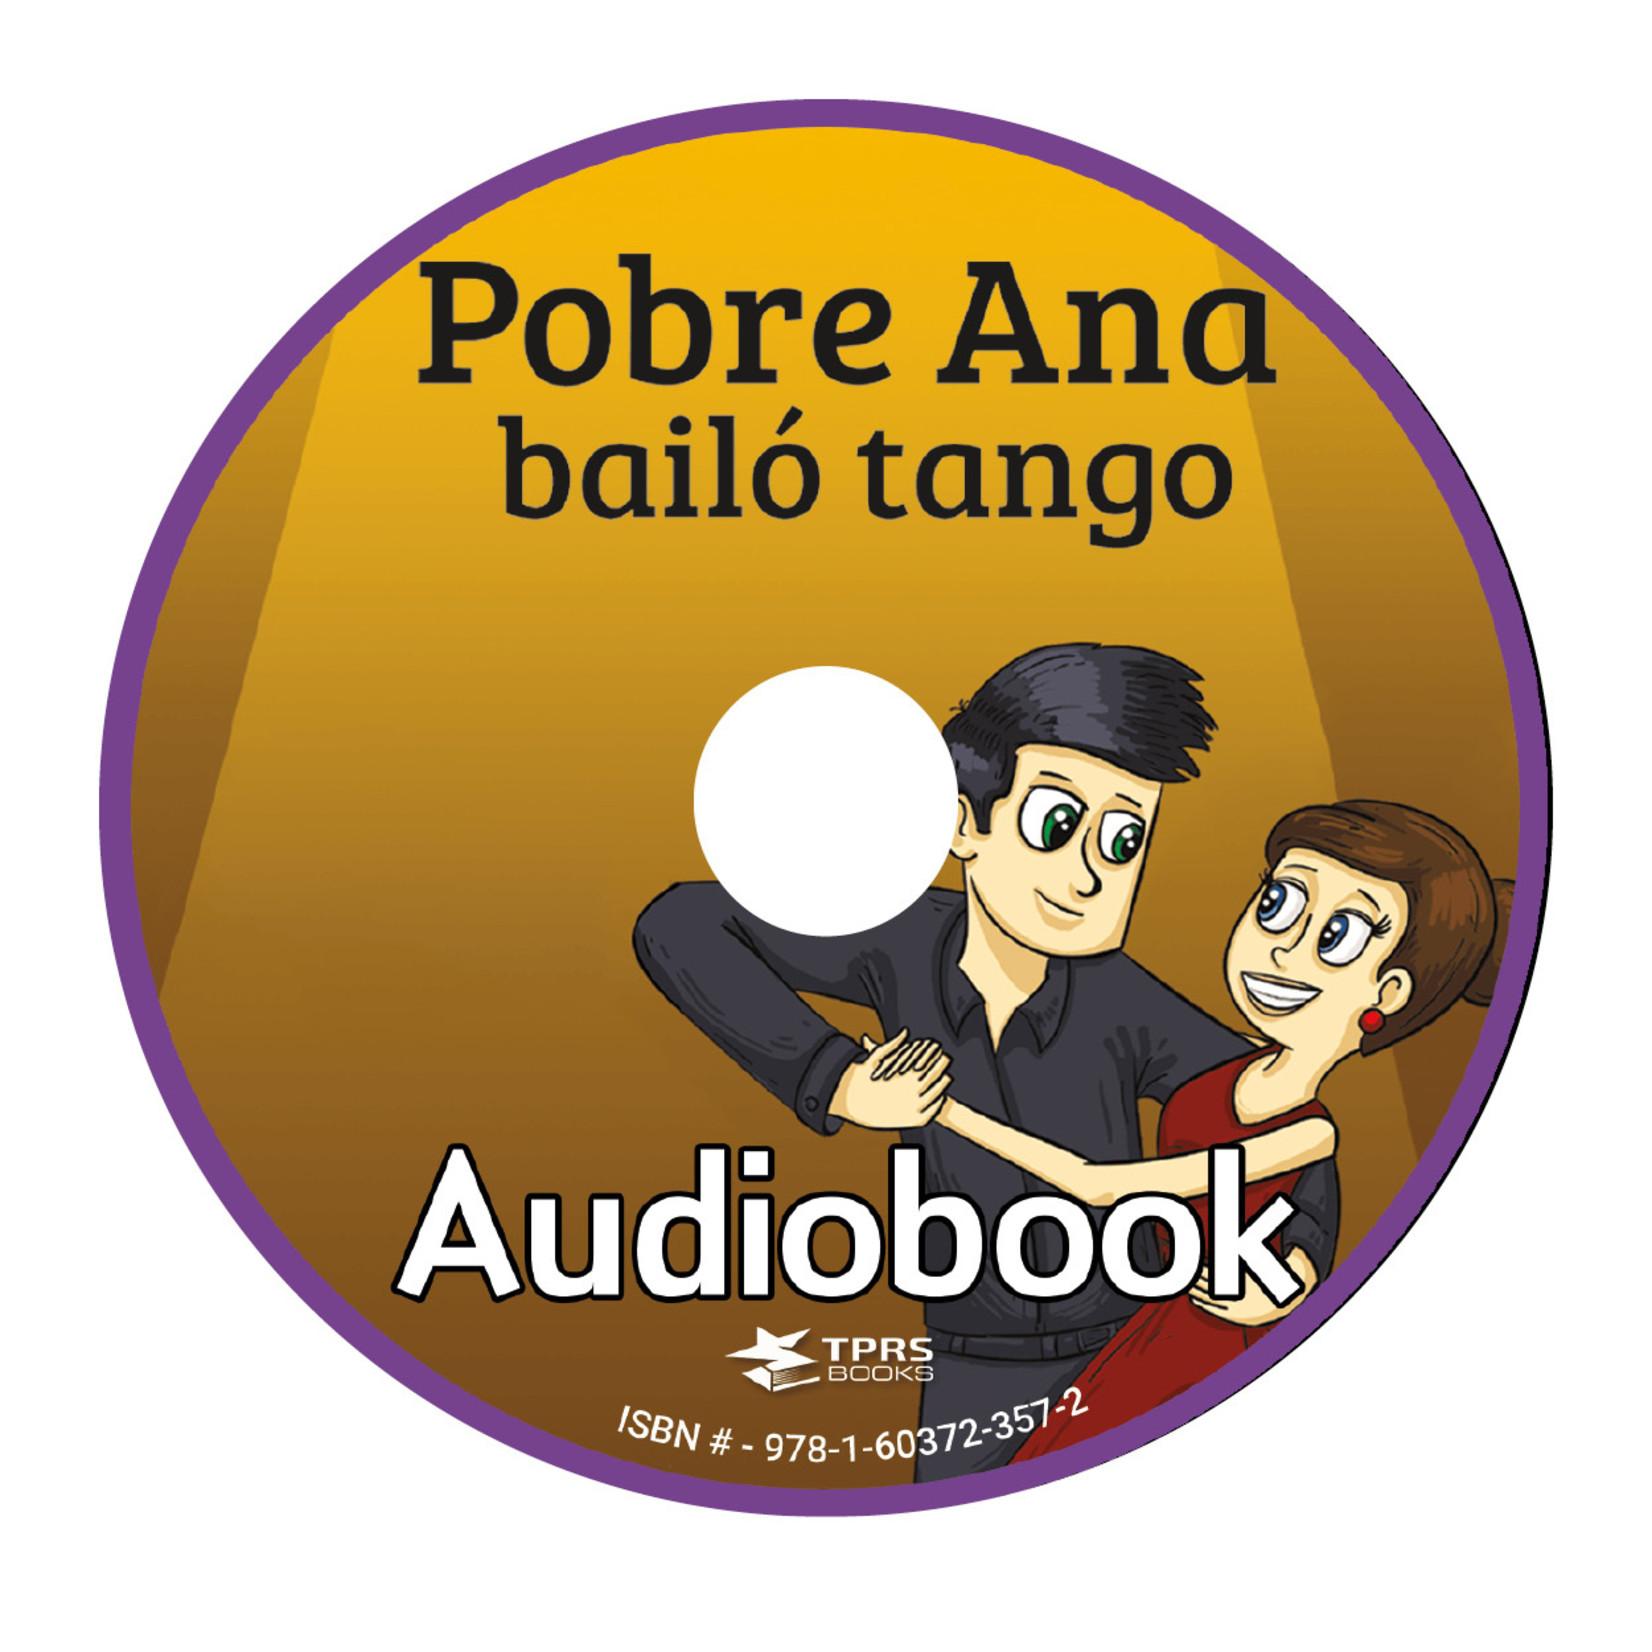 TPRS Books Pobre Ana bailó tango - Luisterboek